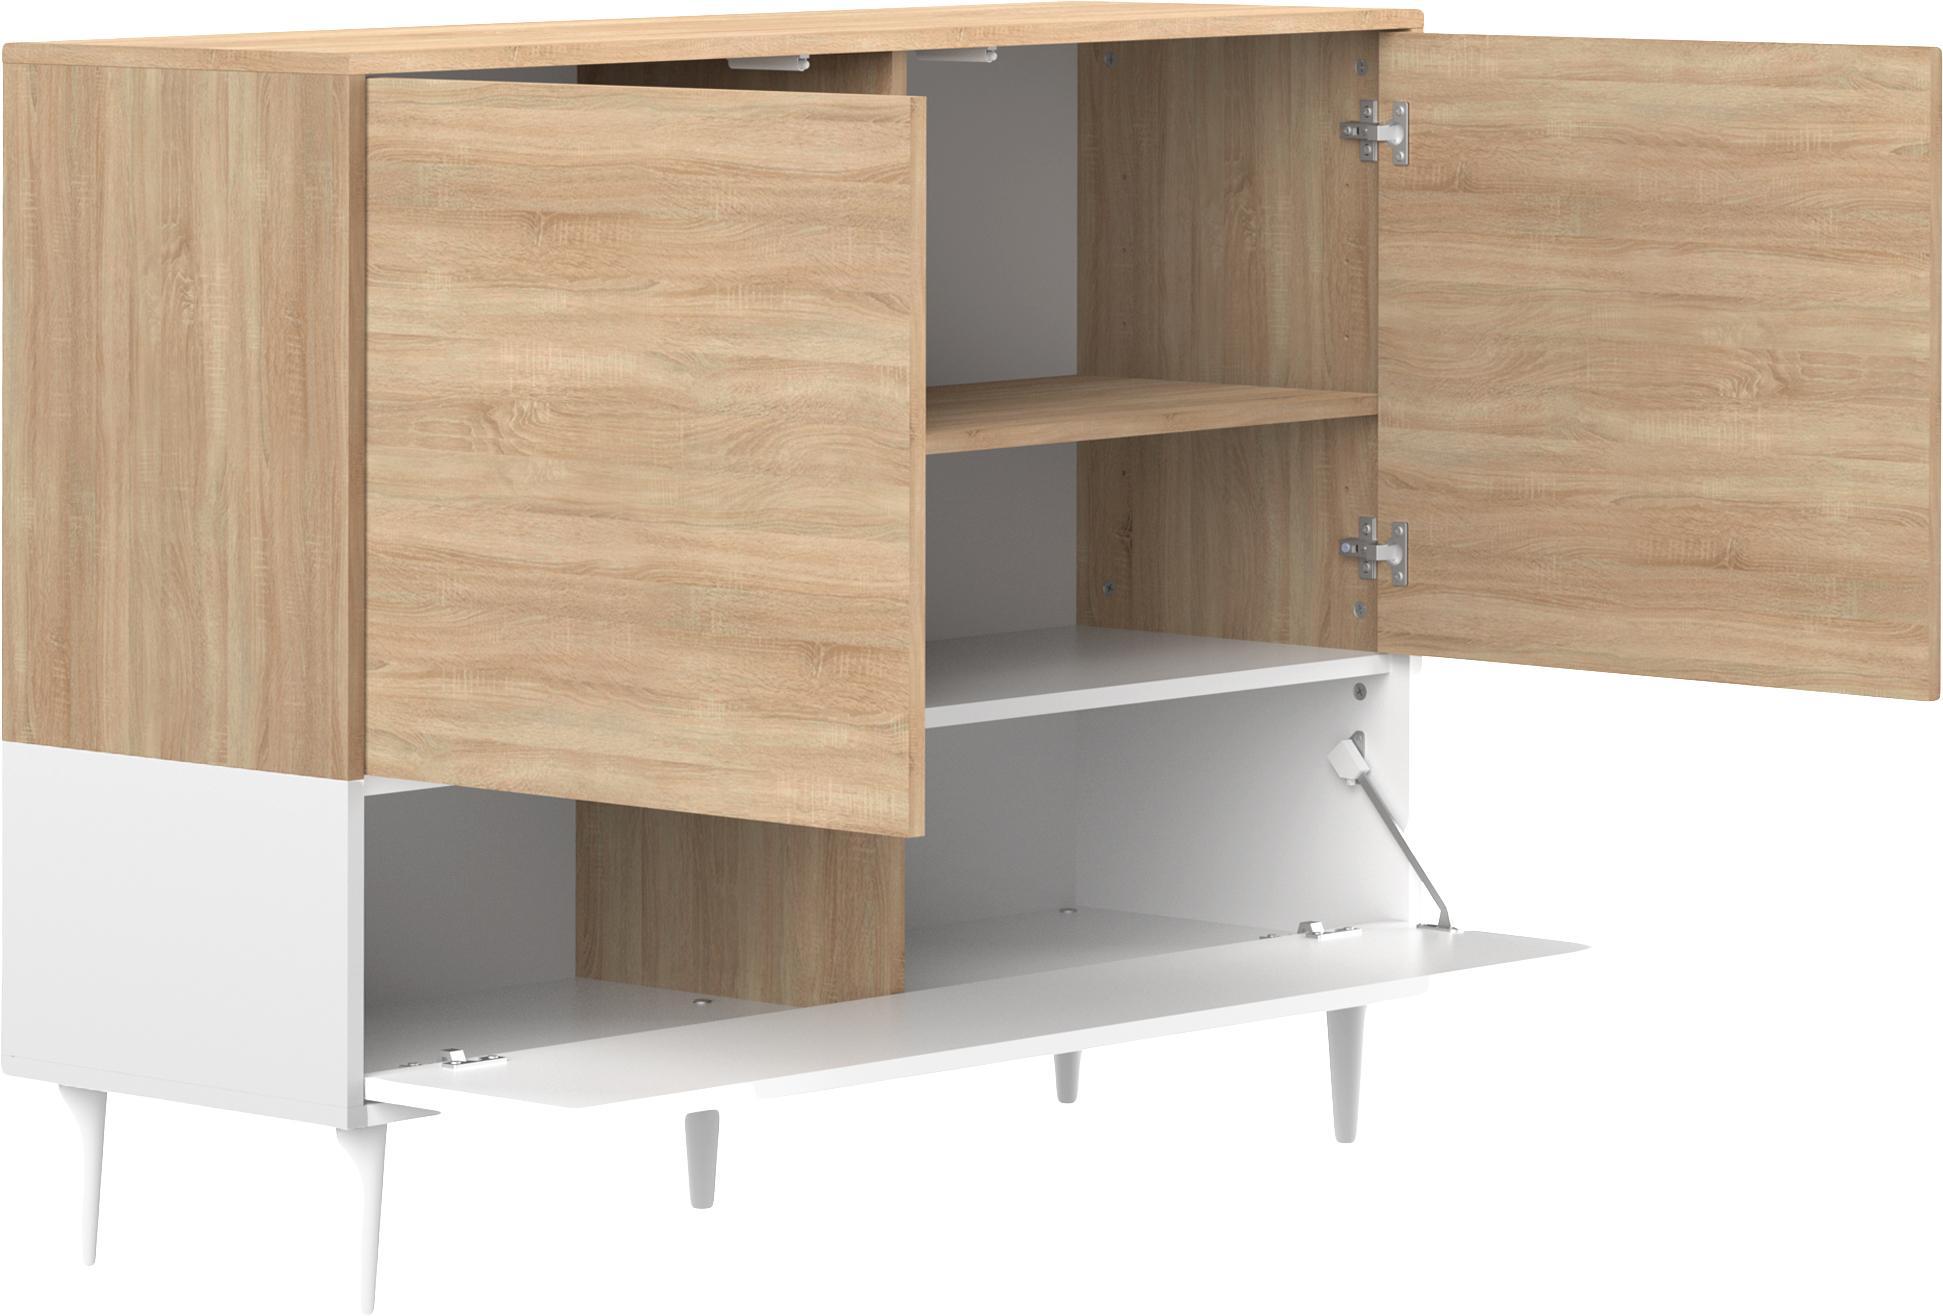 Sideboard Horizon im Skandi Design, Korpus: Spanplatte, melaminbeschi, Füße: Buchenholz, massiv, lacki, Eichenholz, Weiß, 120 x 95 cm